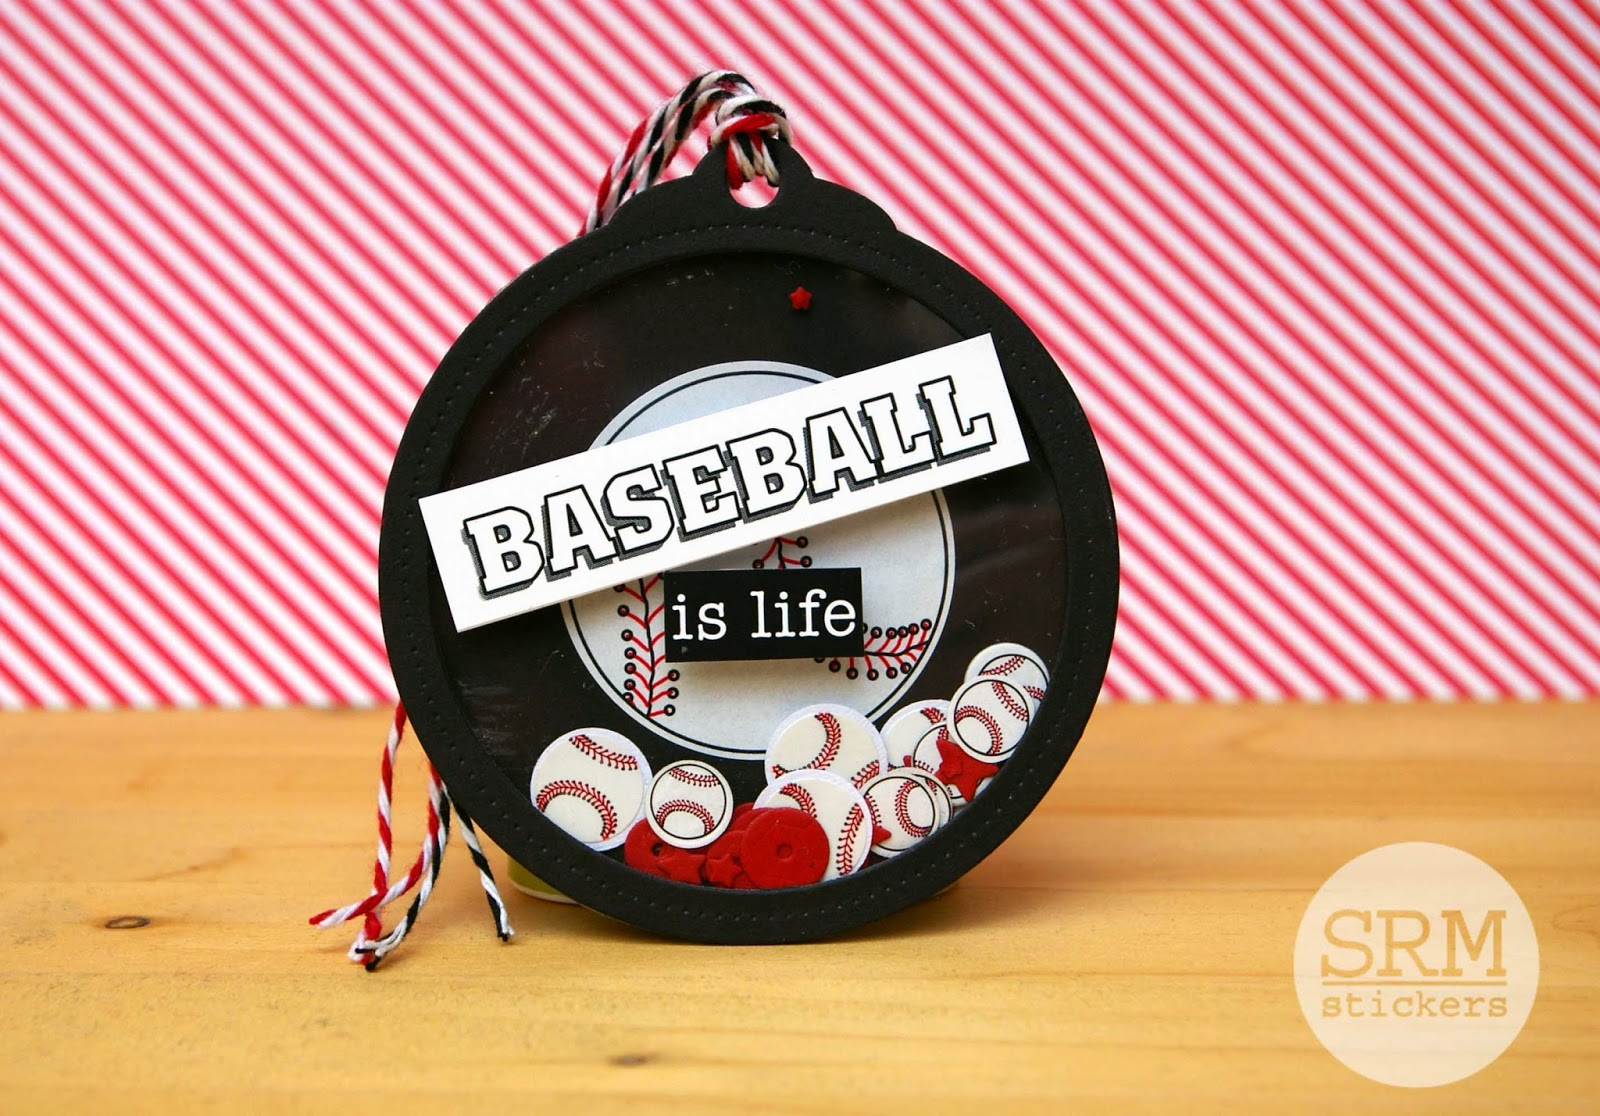 SRM Stickers Blog - Baseball is Life Shaker Tag by Lorena - #tag #shaker #sports #baseball #twine #stickers